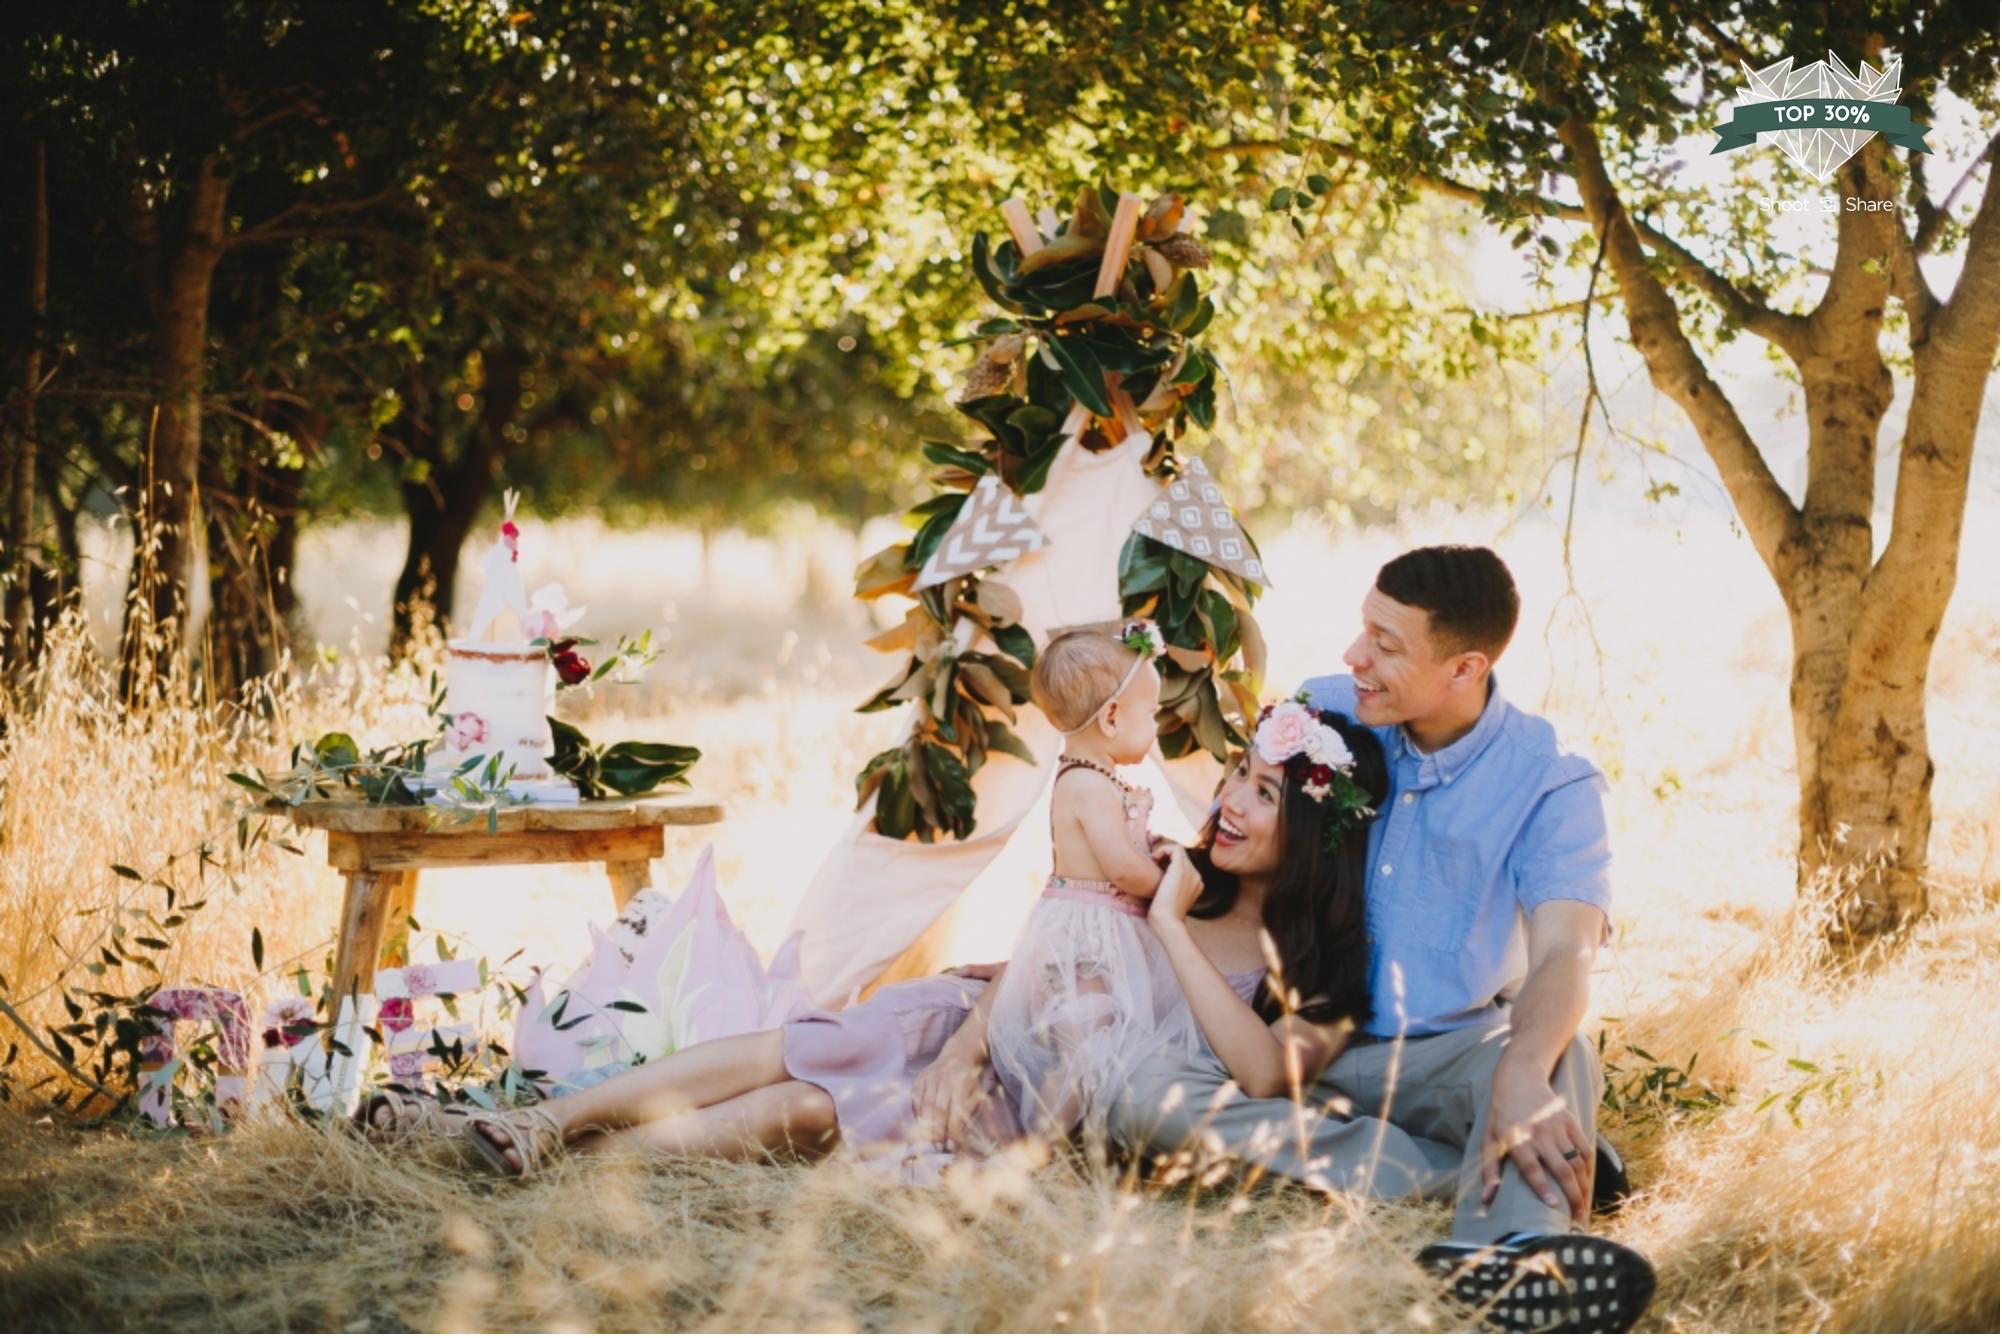 Archer Inspired Photography Shoot and Share Family Wedding Lifestyle Photographer Morgan Hill California San Francisco Bay Area-6.jpg